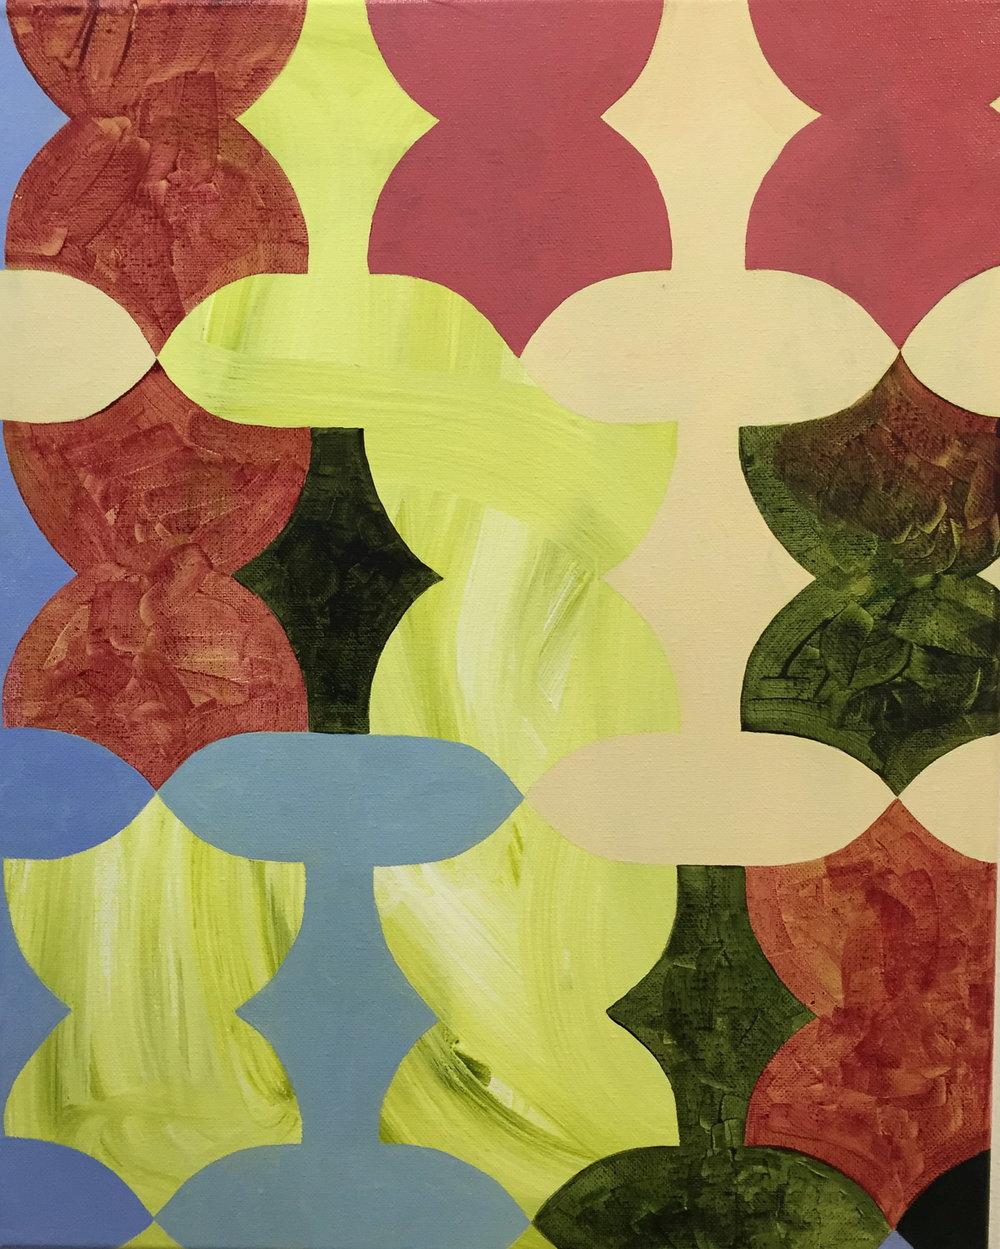 acrylic on paper, 30x22, 2015